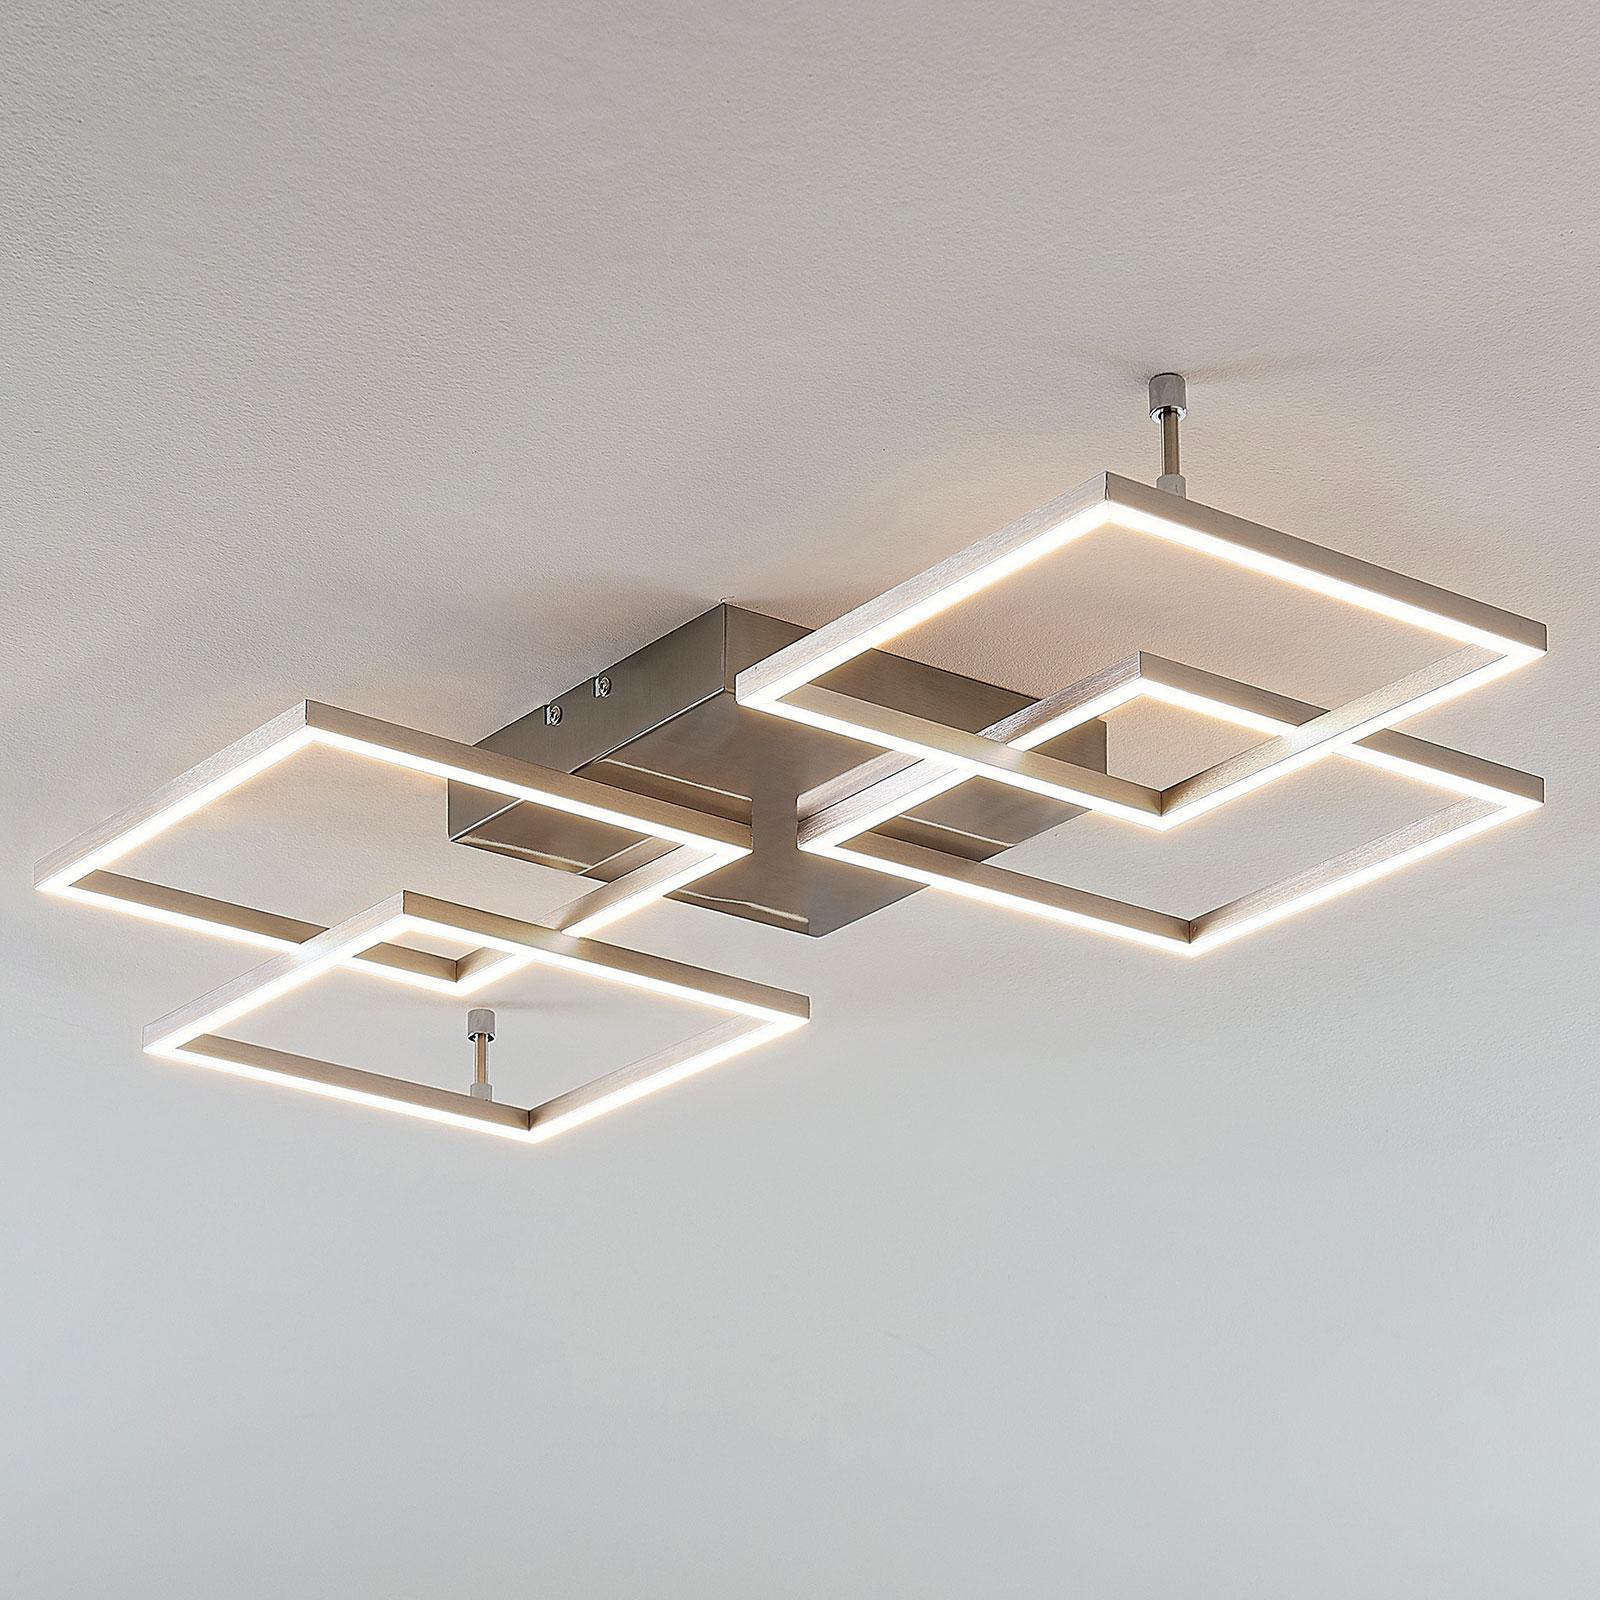 LED-Deckenlampe Quadra, dimmbar, 4-flg., 80,5 cm